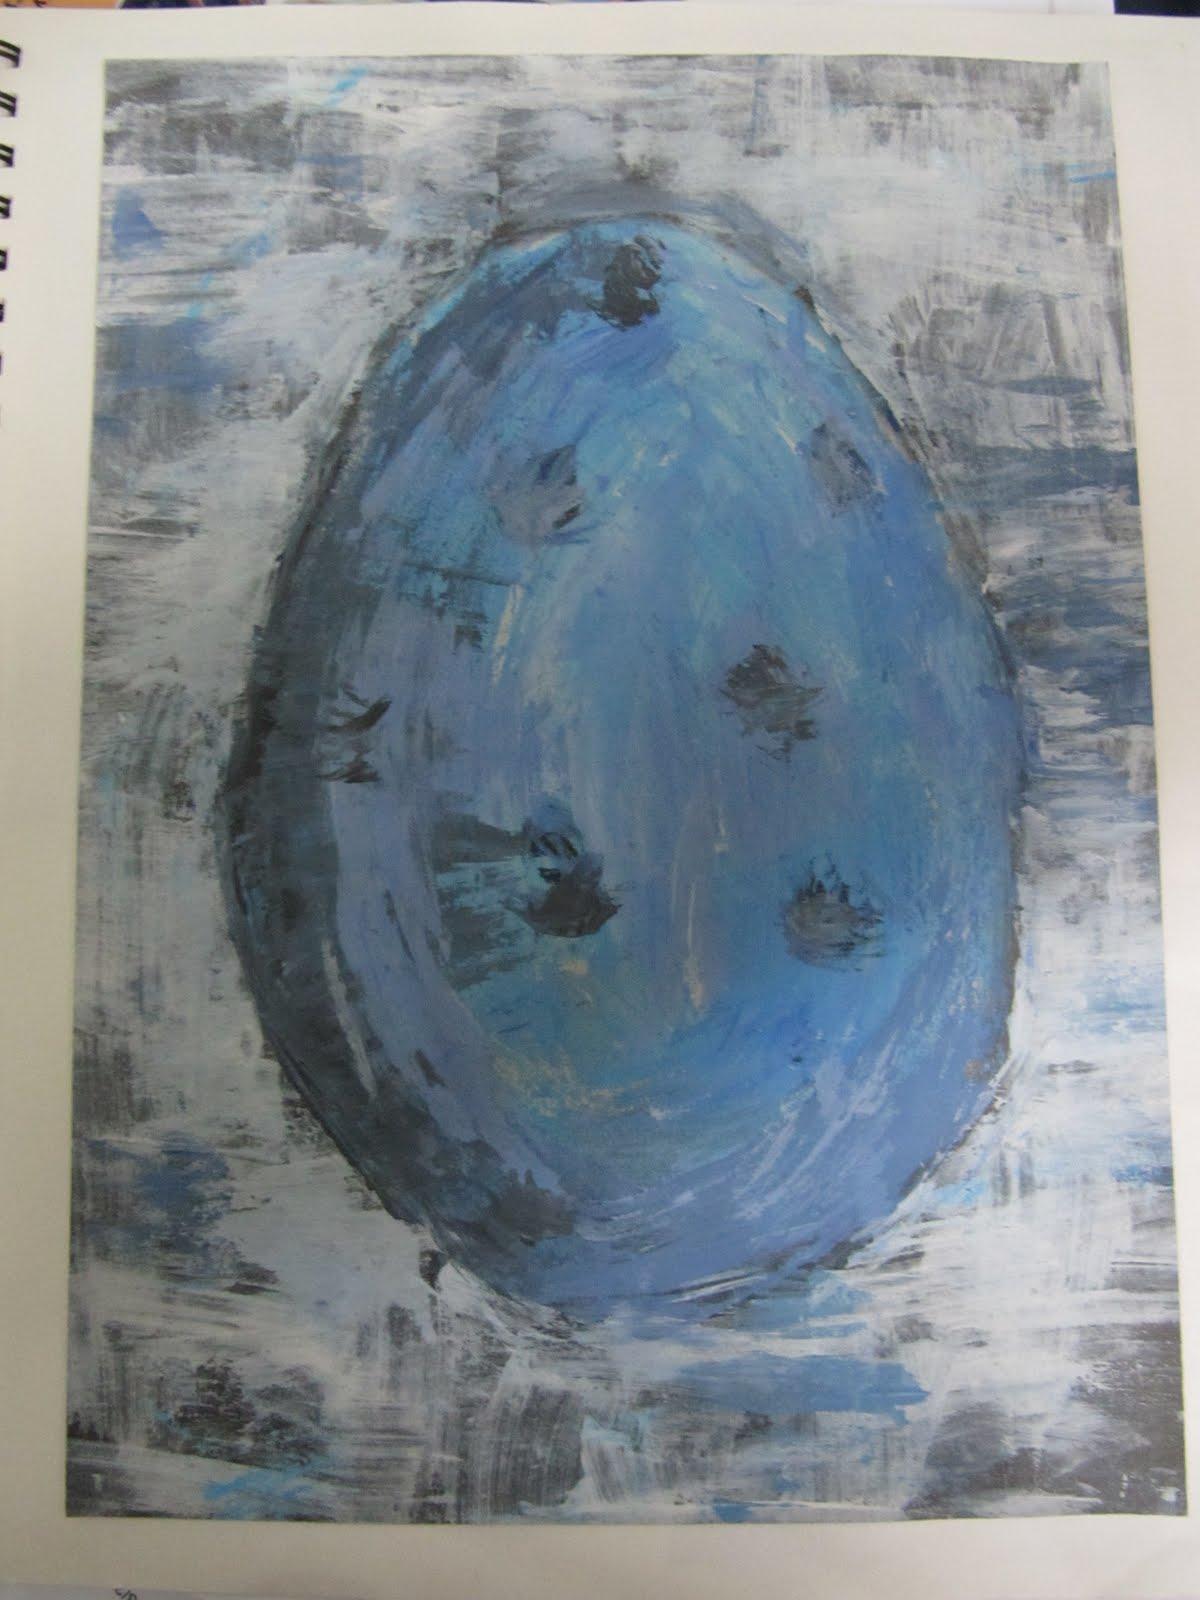 A-level Art exam topic help?